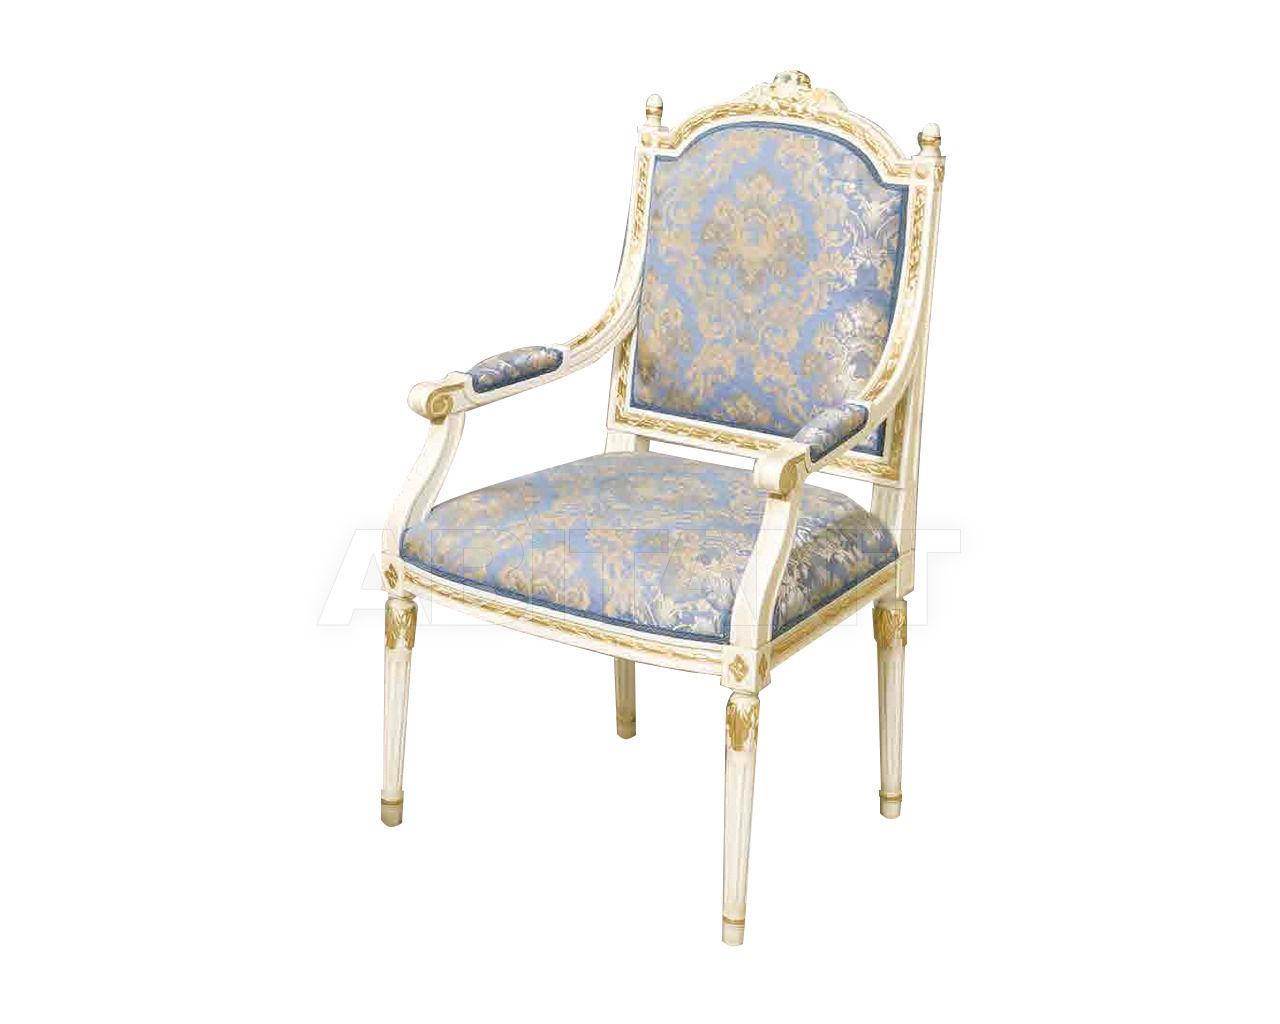 Купить Стул с подлокотниками Stil Salotti di Origgi Luigi e Figli s.n.c. 2013 G 4204 Armchair